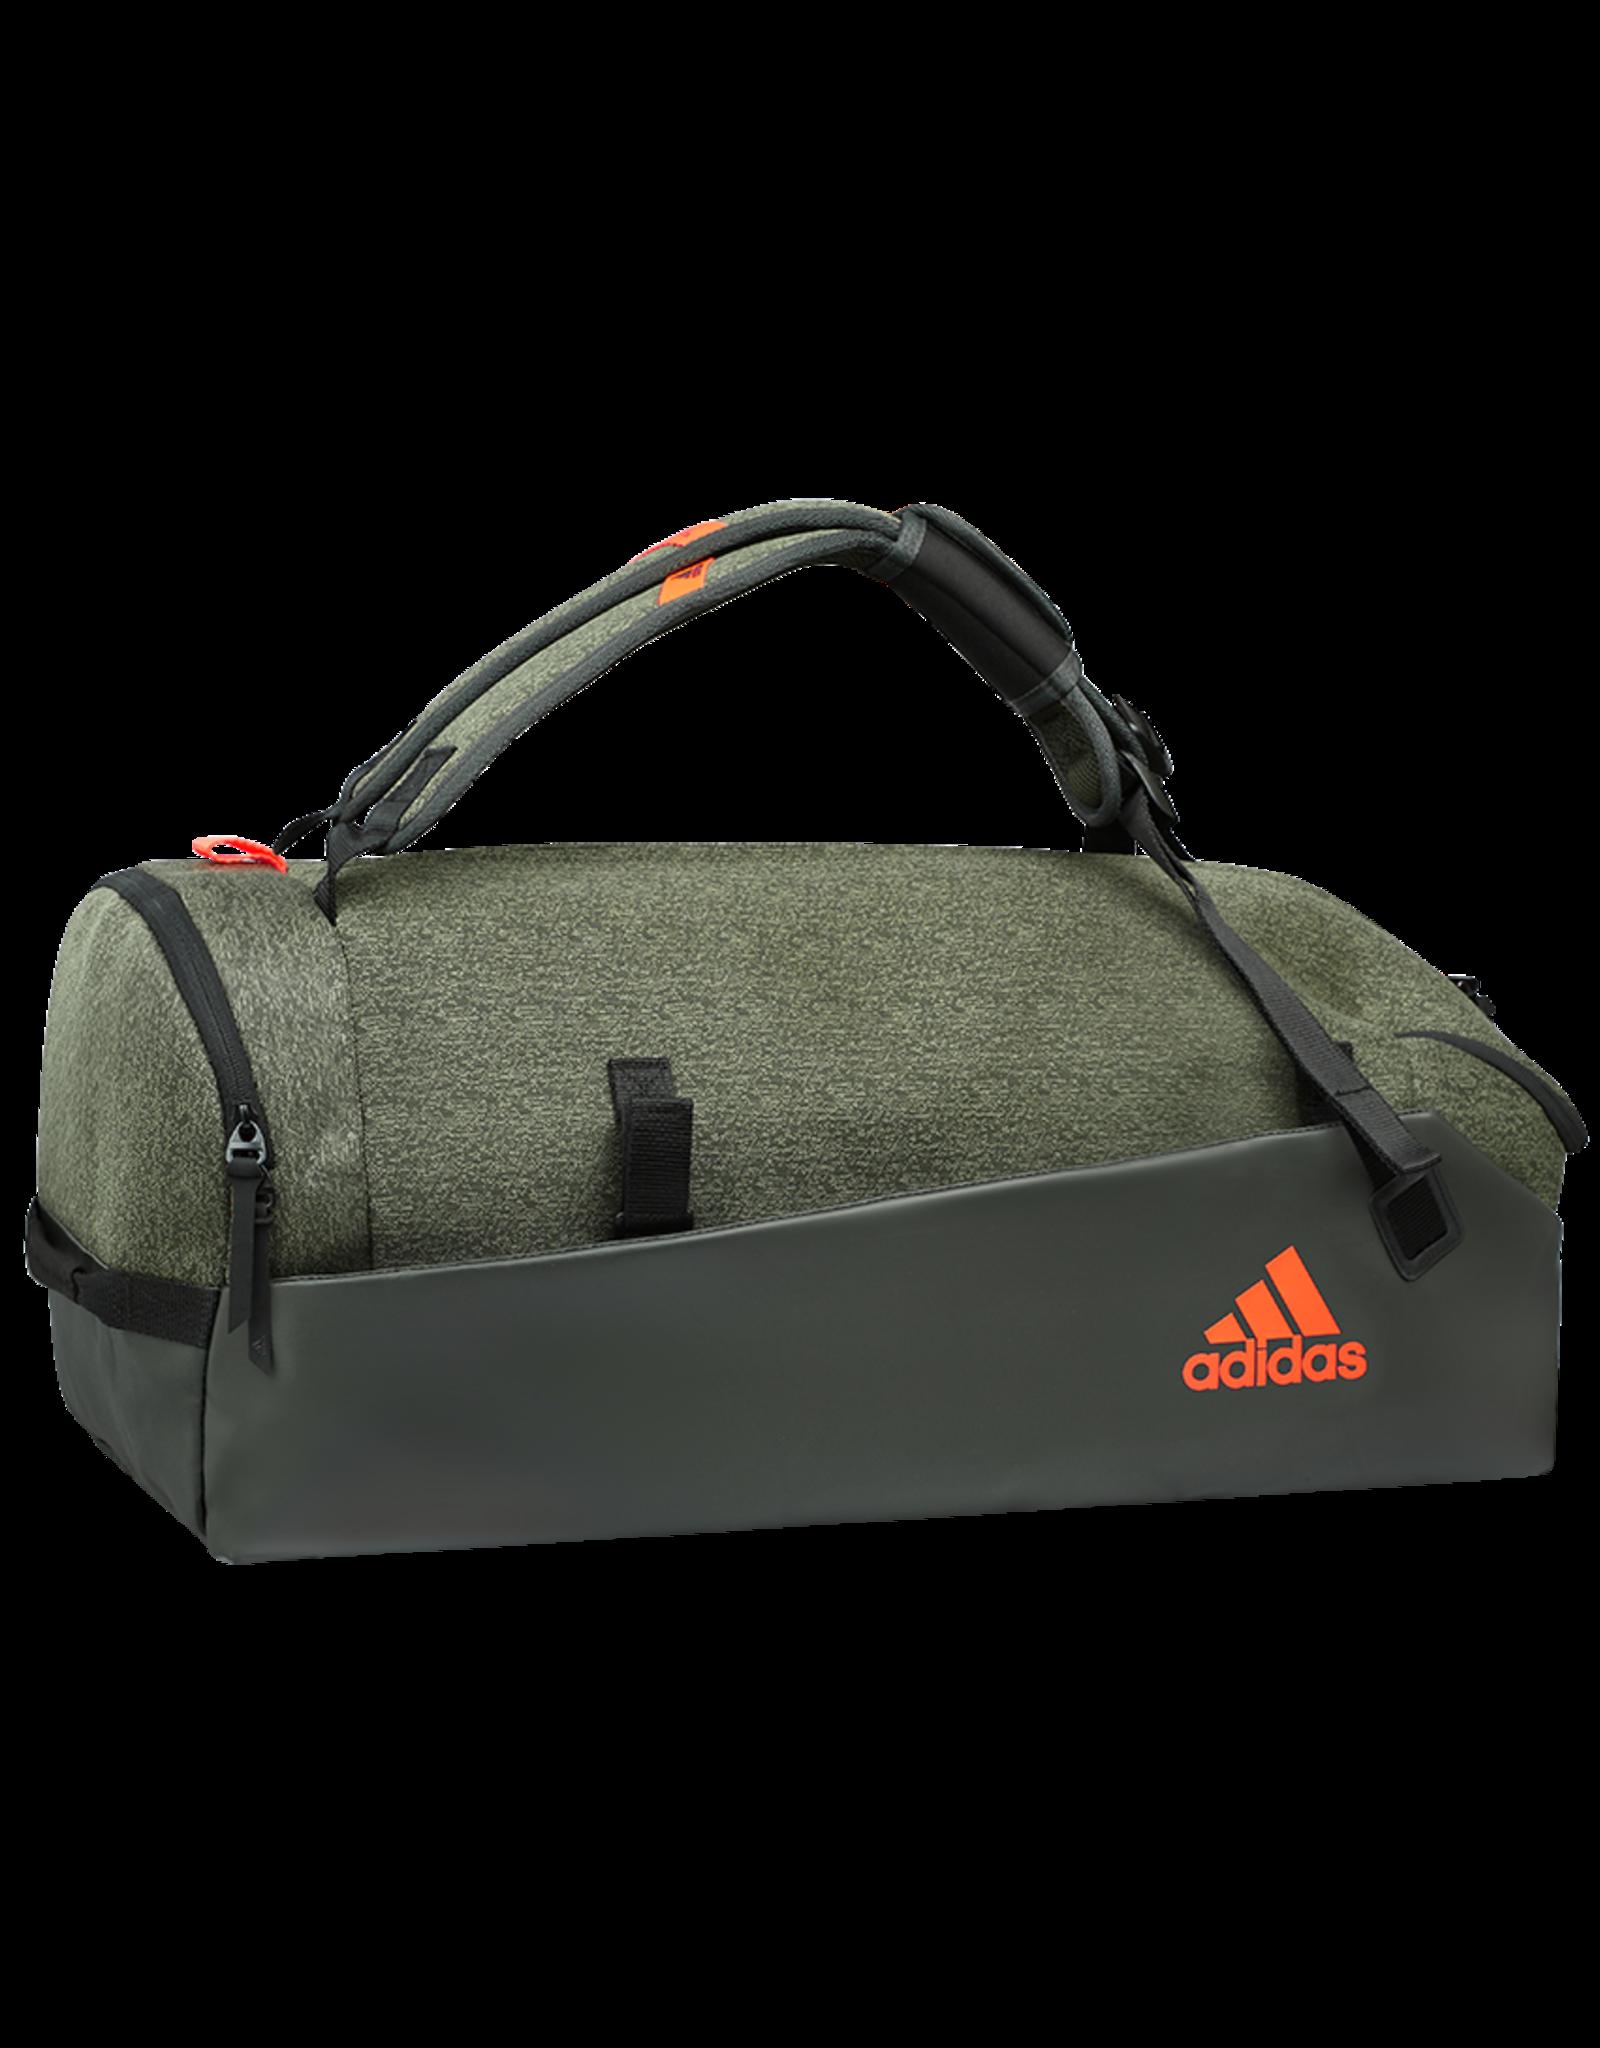 Adidas H5 HOLDALL